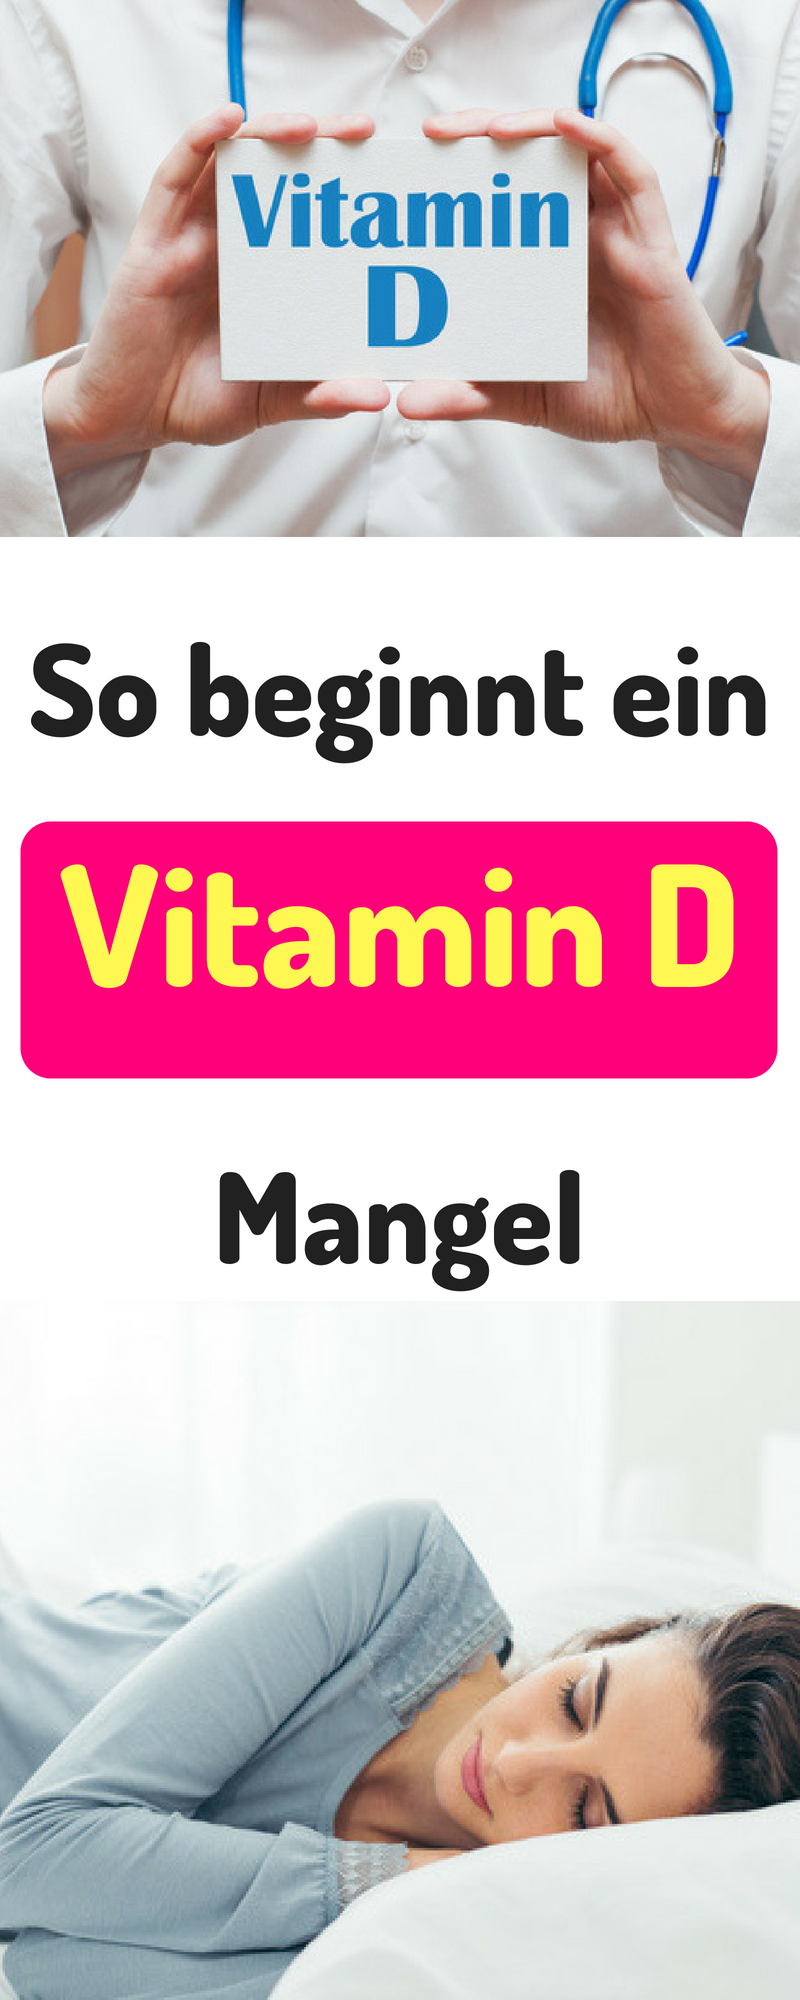 Vitamin d mangel cellulite